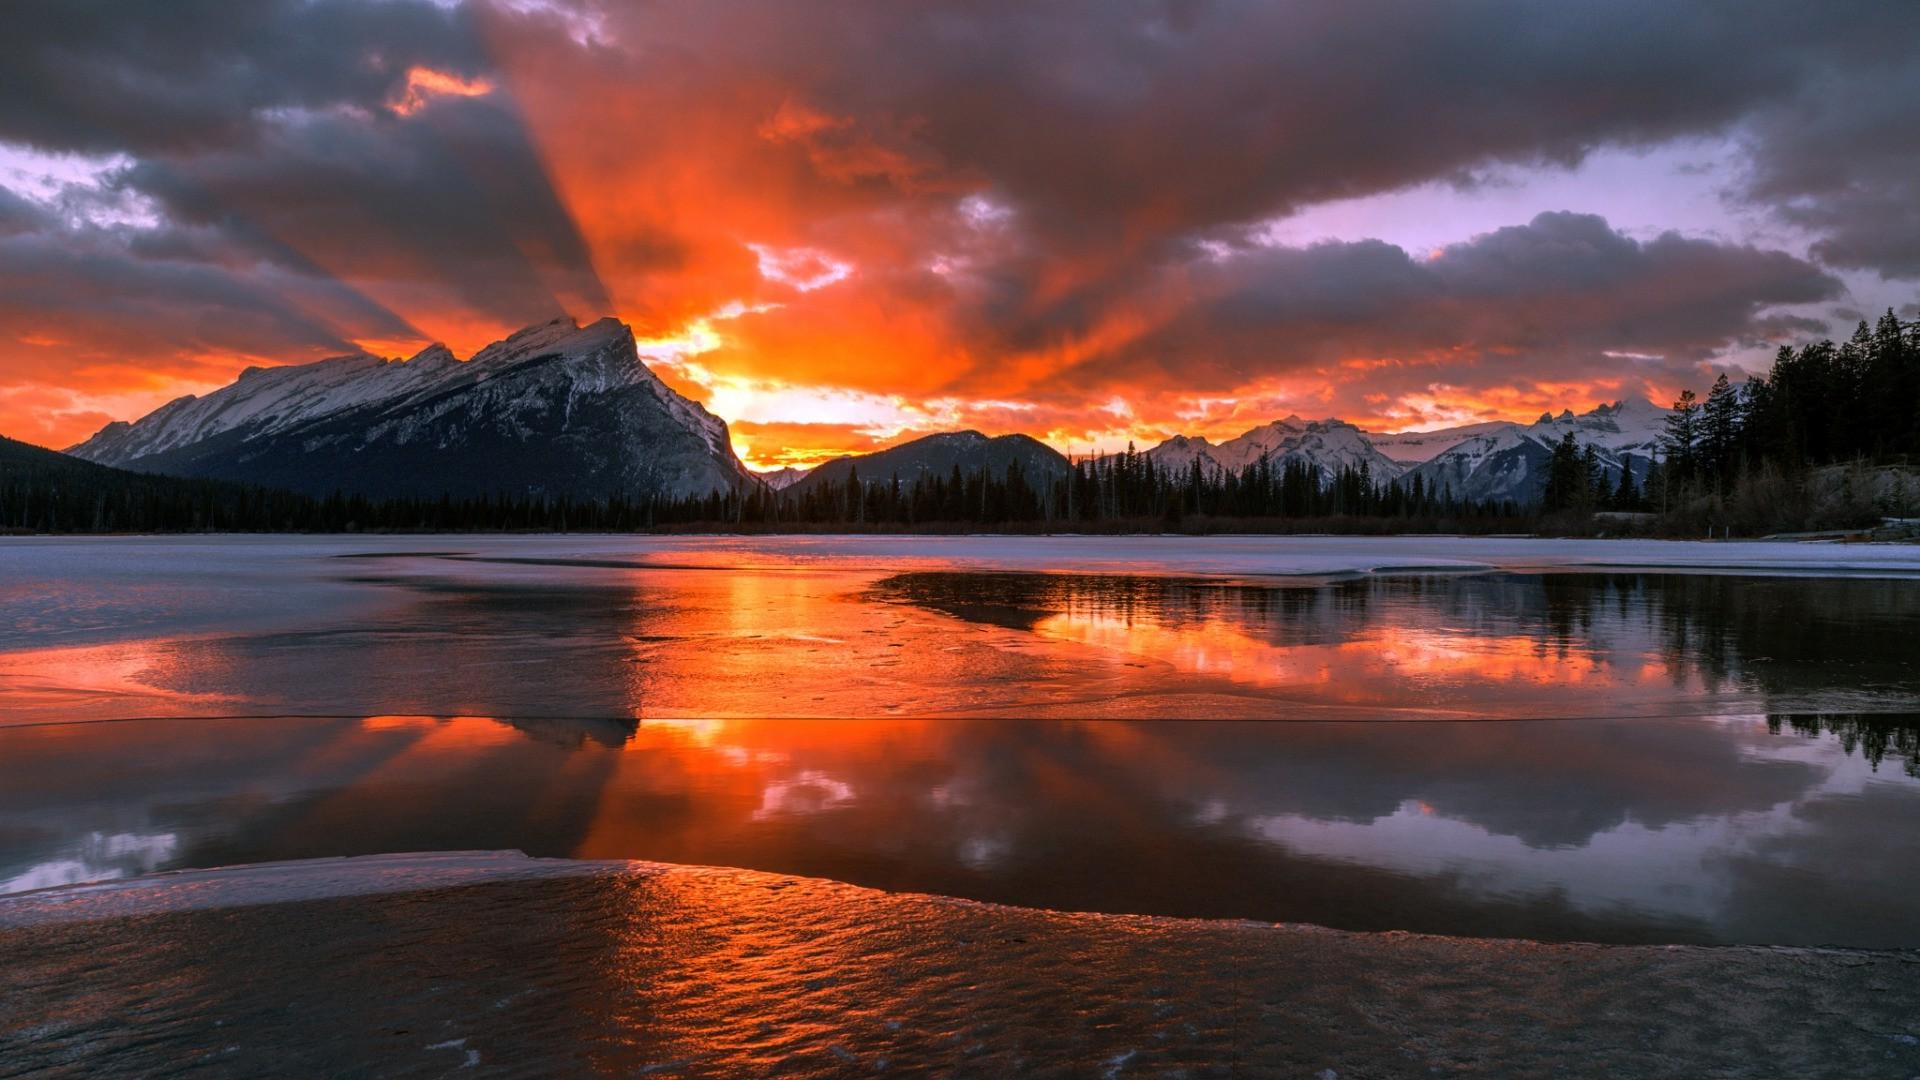 Niagara Falls Hd 1080p Wallpapers Nature Landscape Mountain Canada Alberta Snow Winter